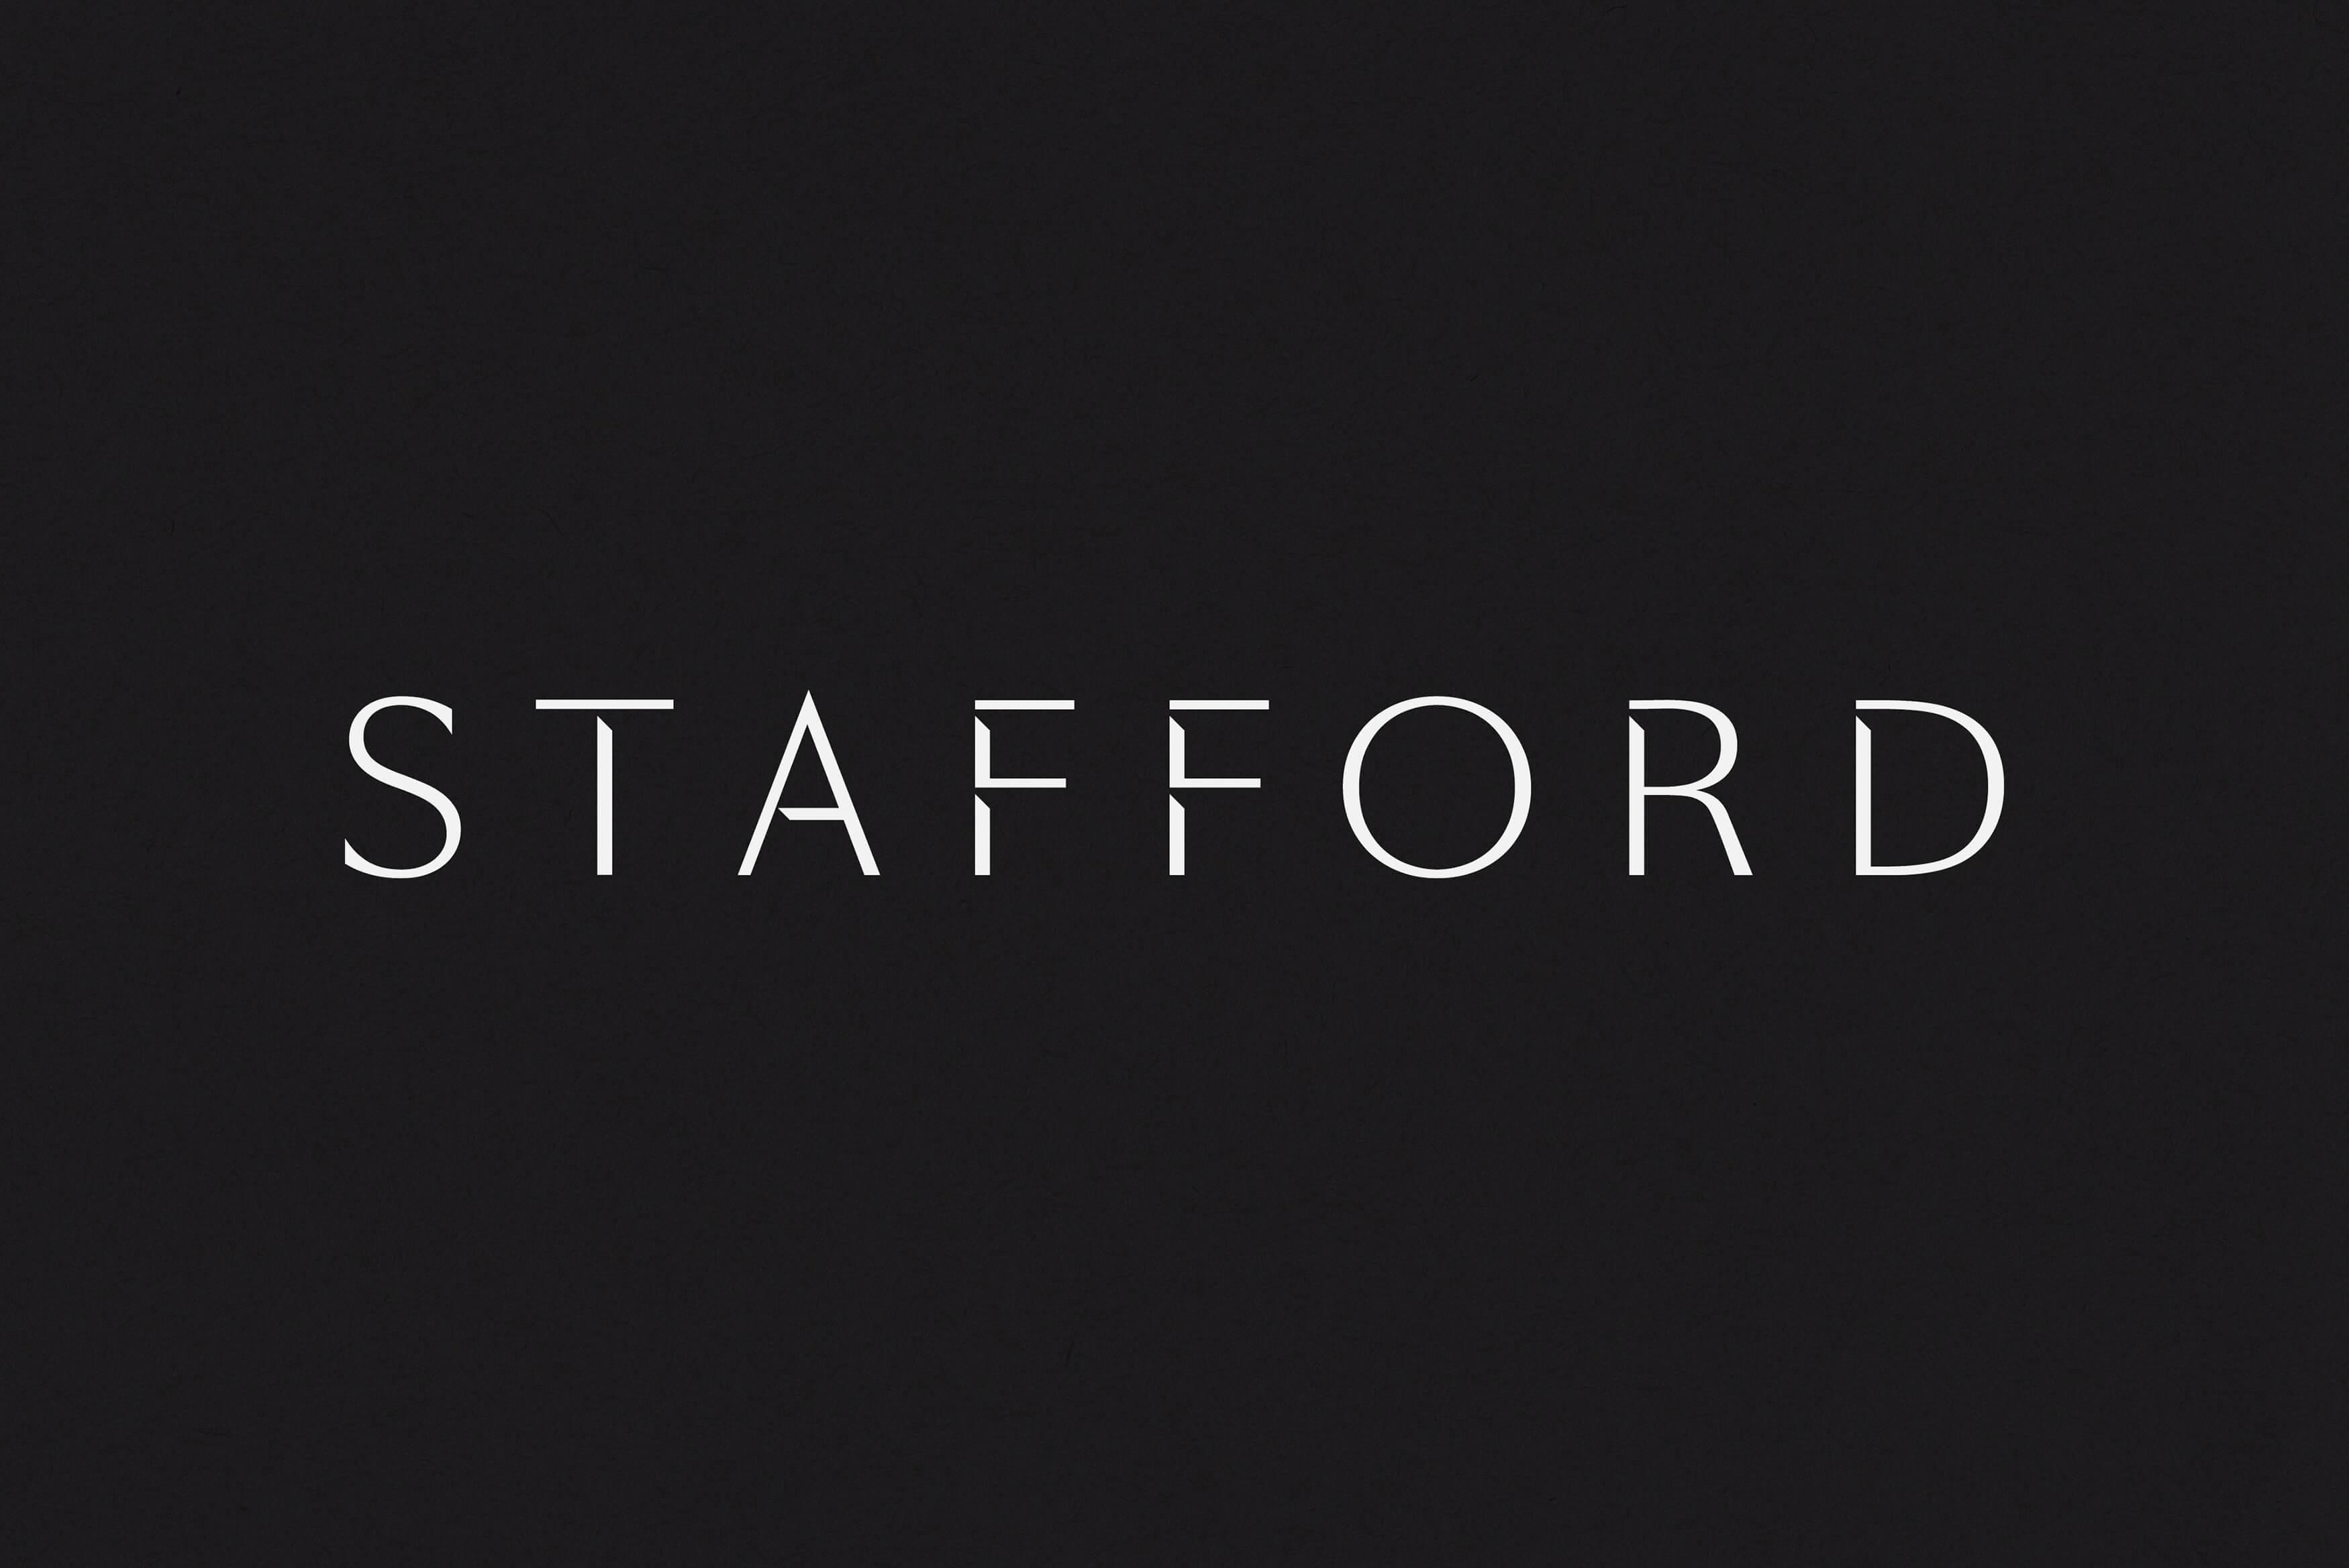 Stafford Architecture - Brand logotype on black background